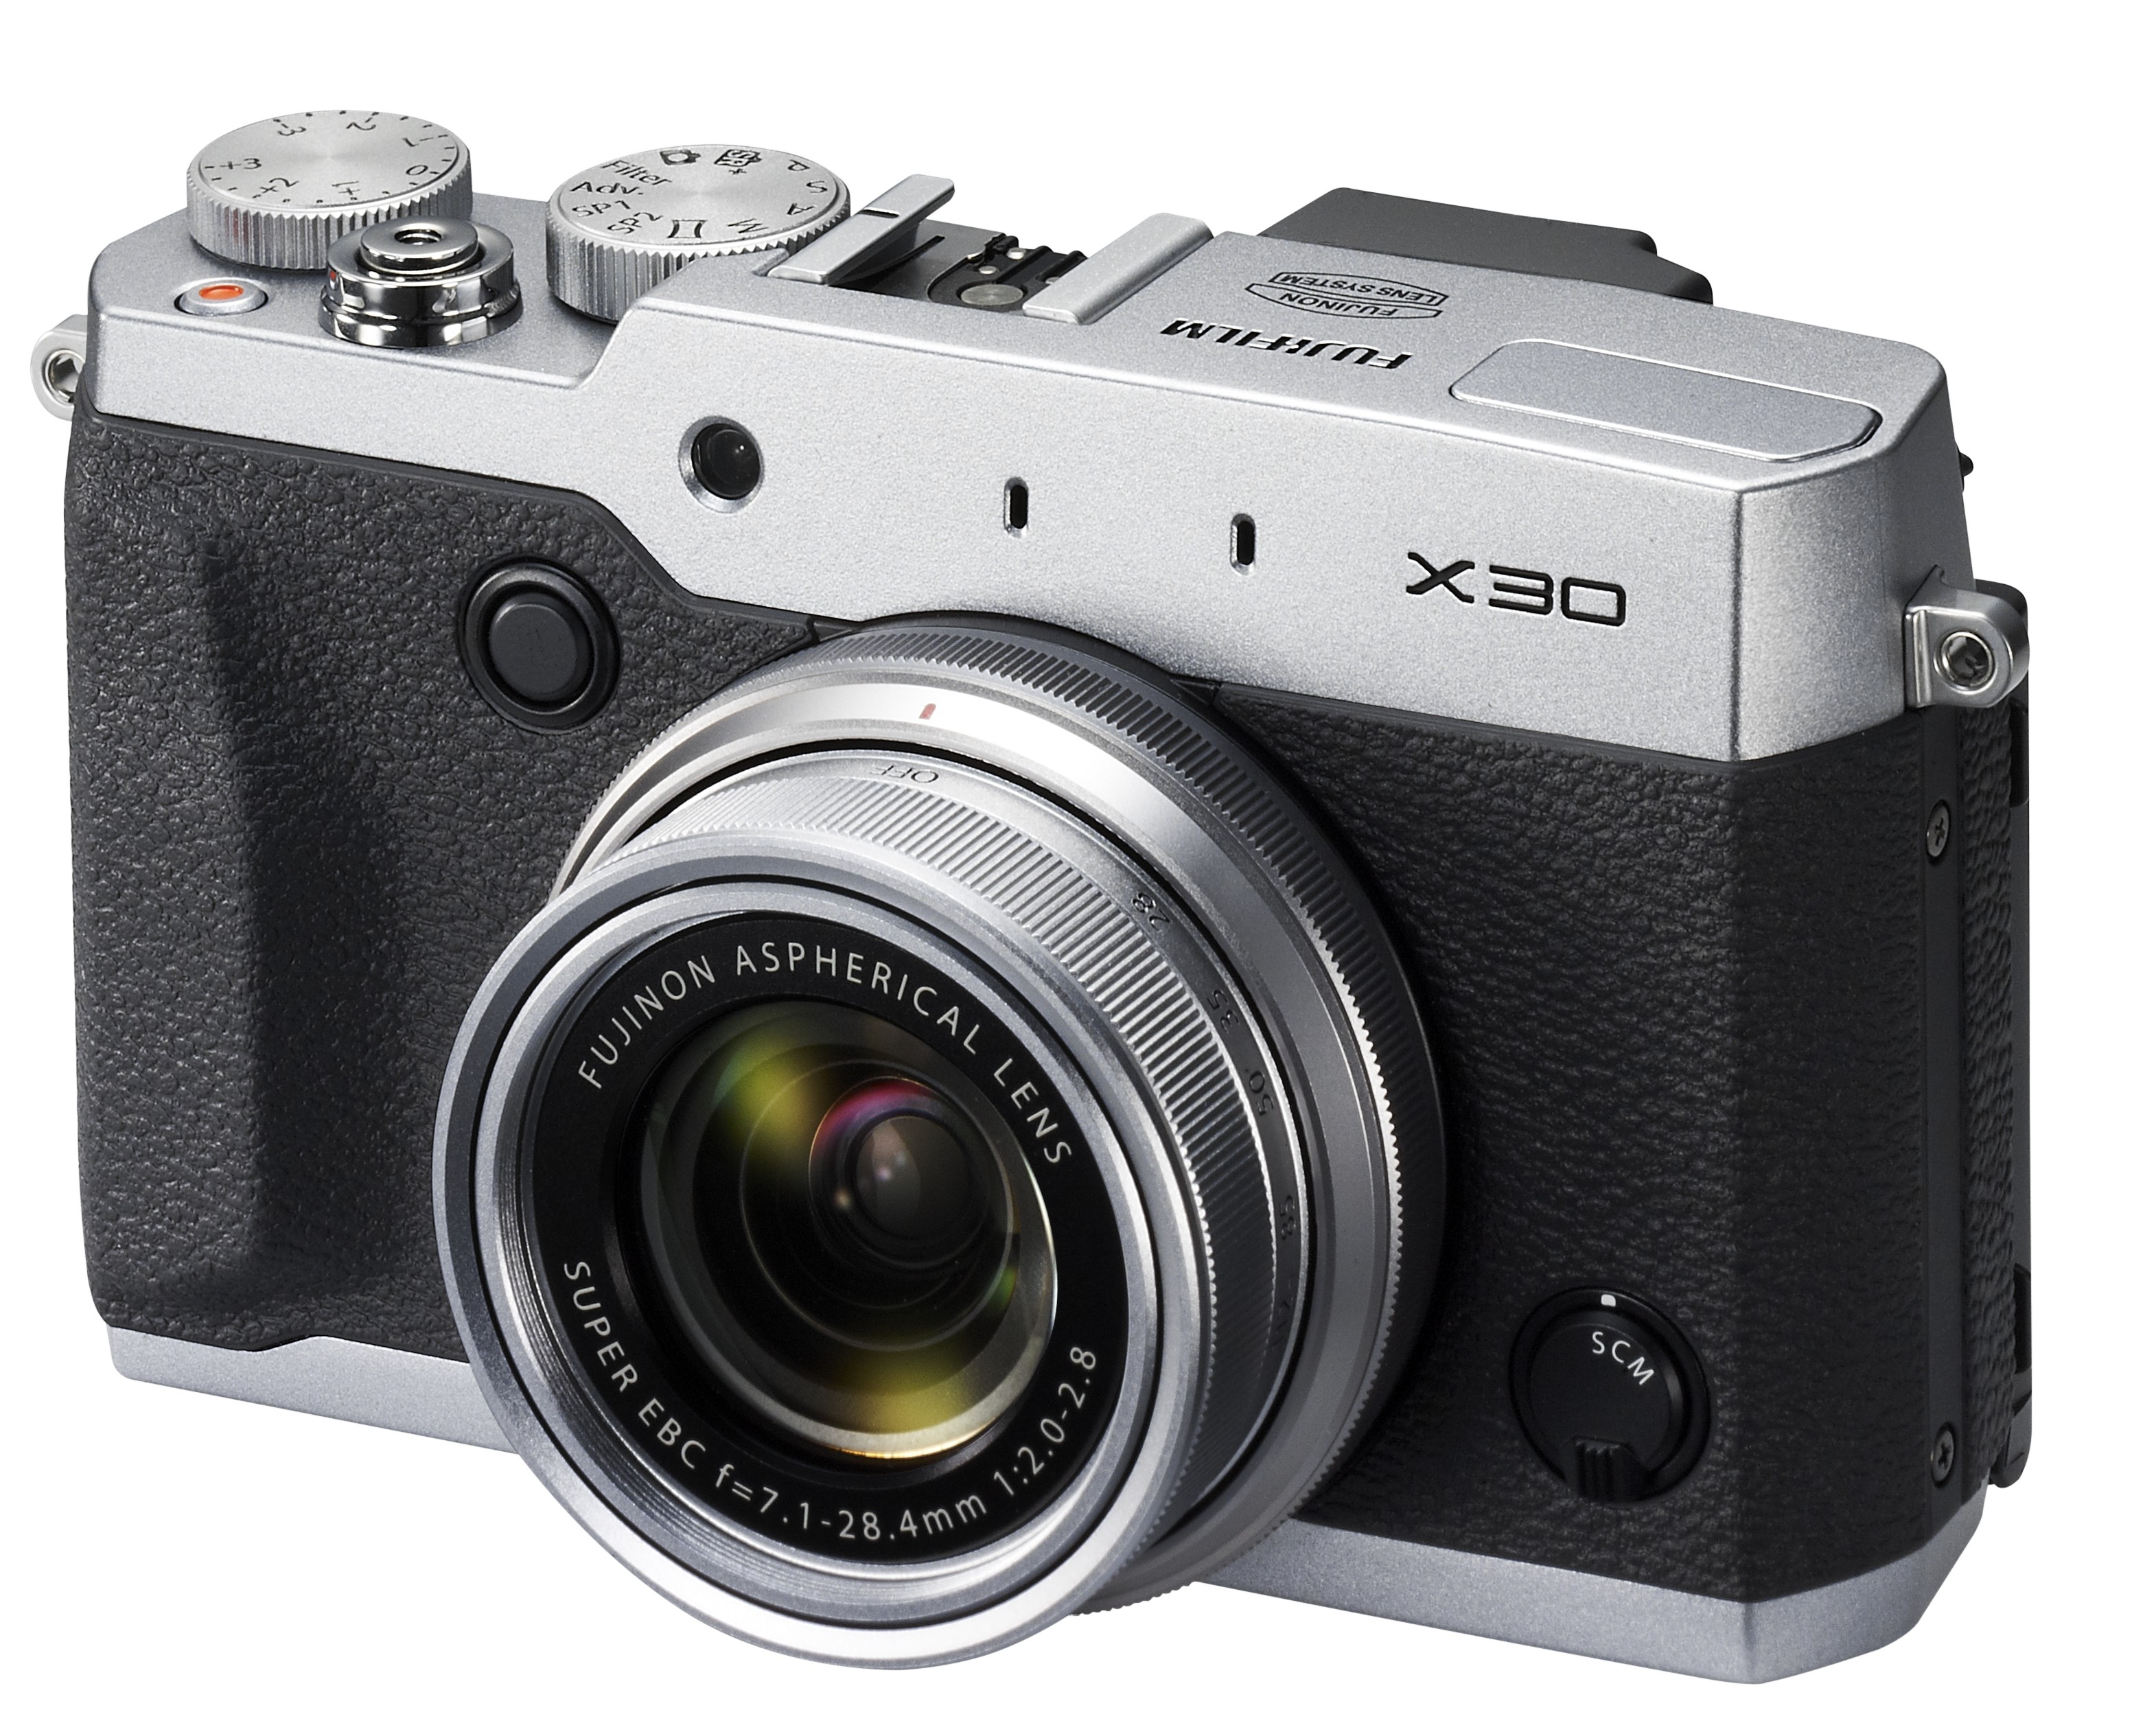 appareil photo fujifilm x30